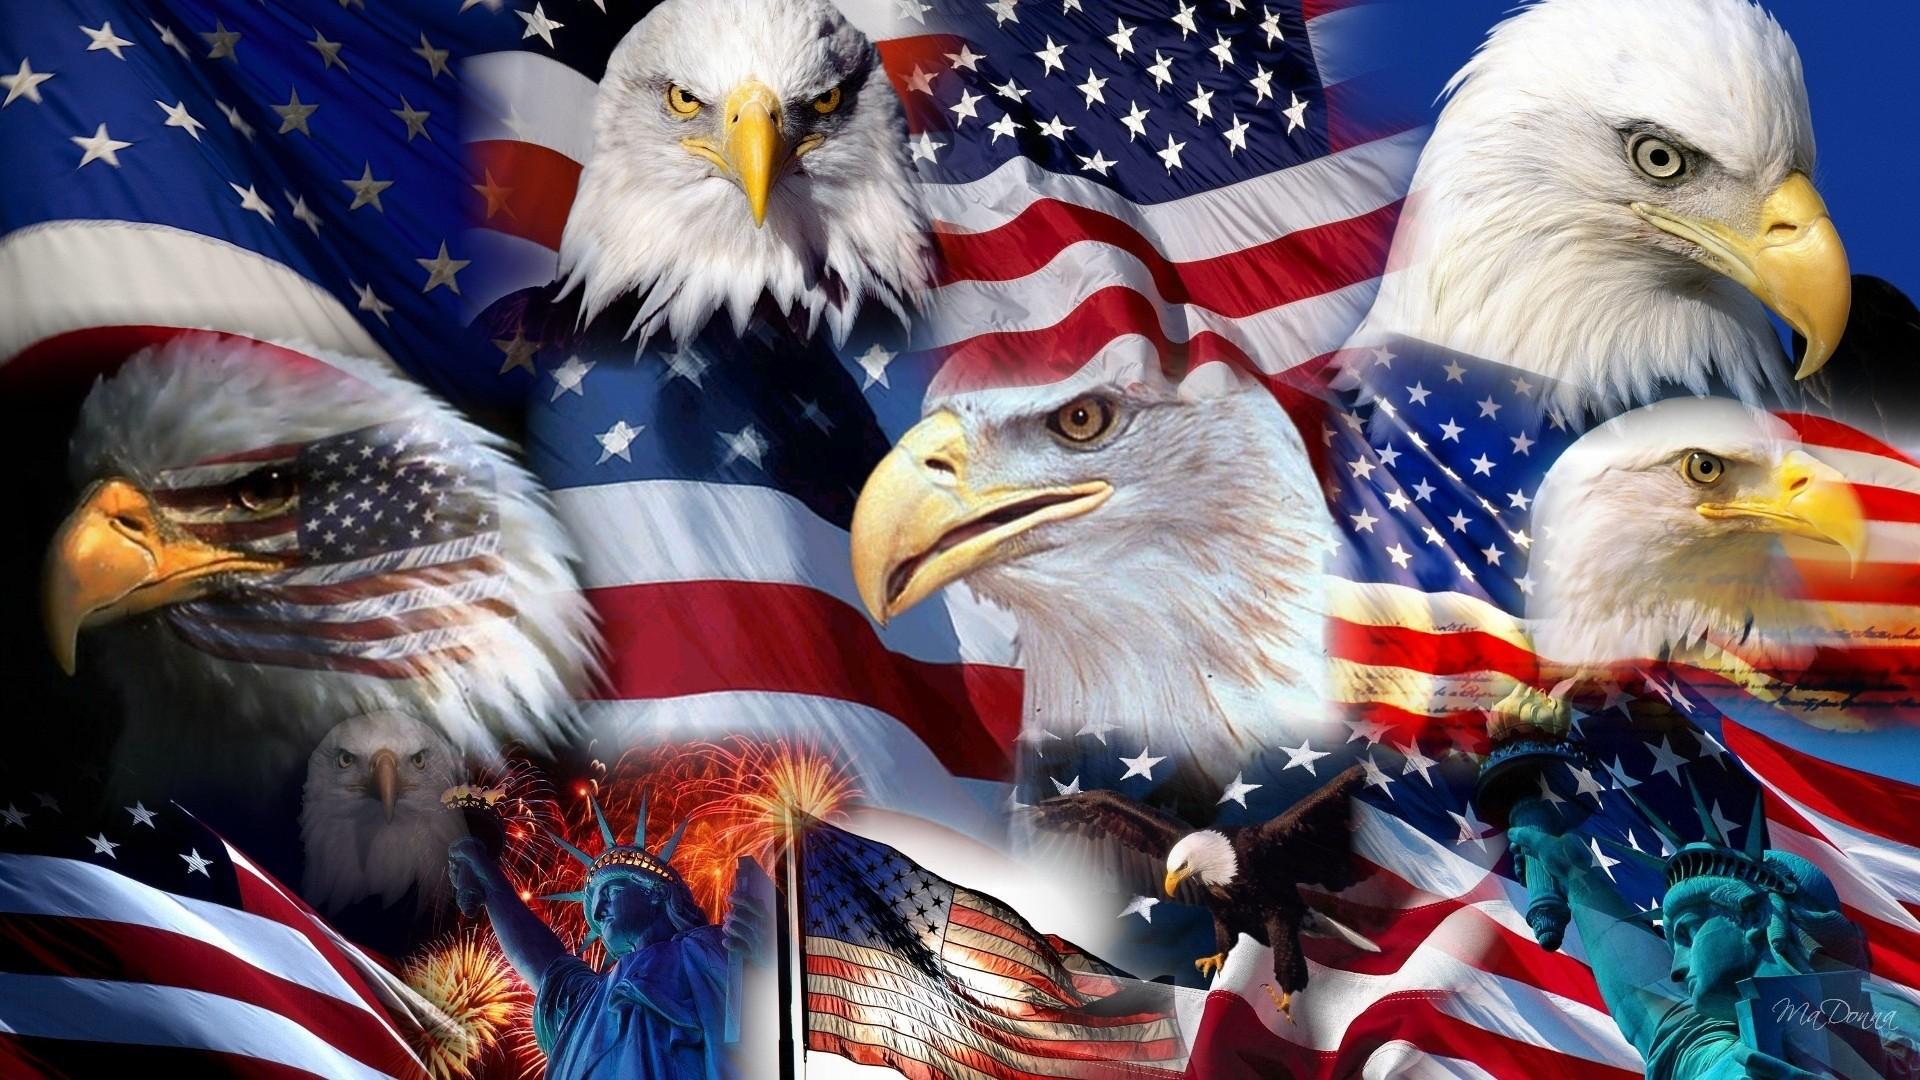 Backgrounds, wallpaper, Patriotic Desktop Backgrounds hd wallpaper .